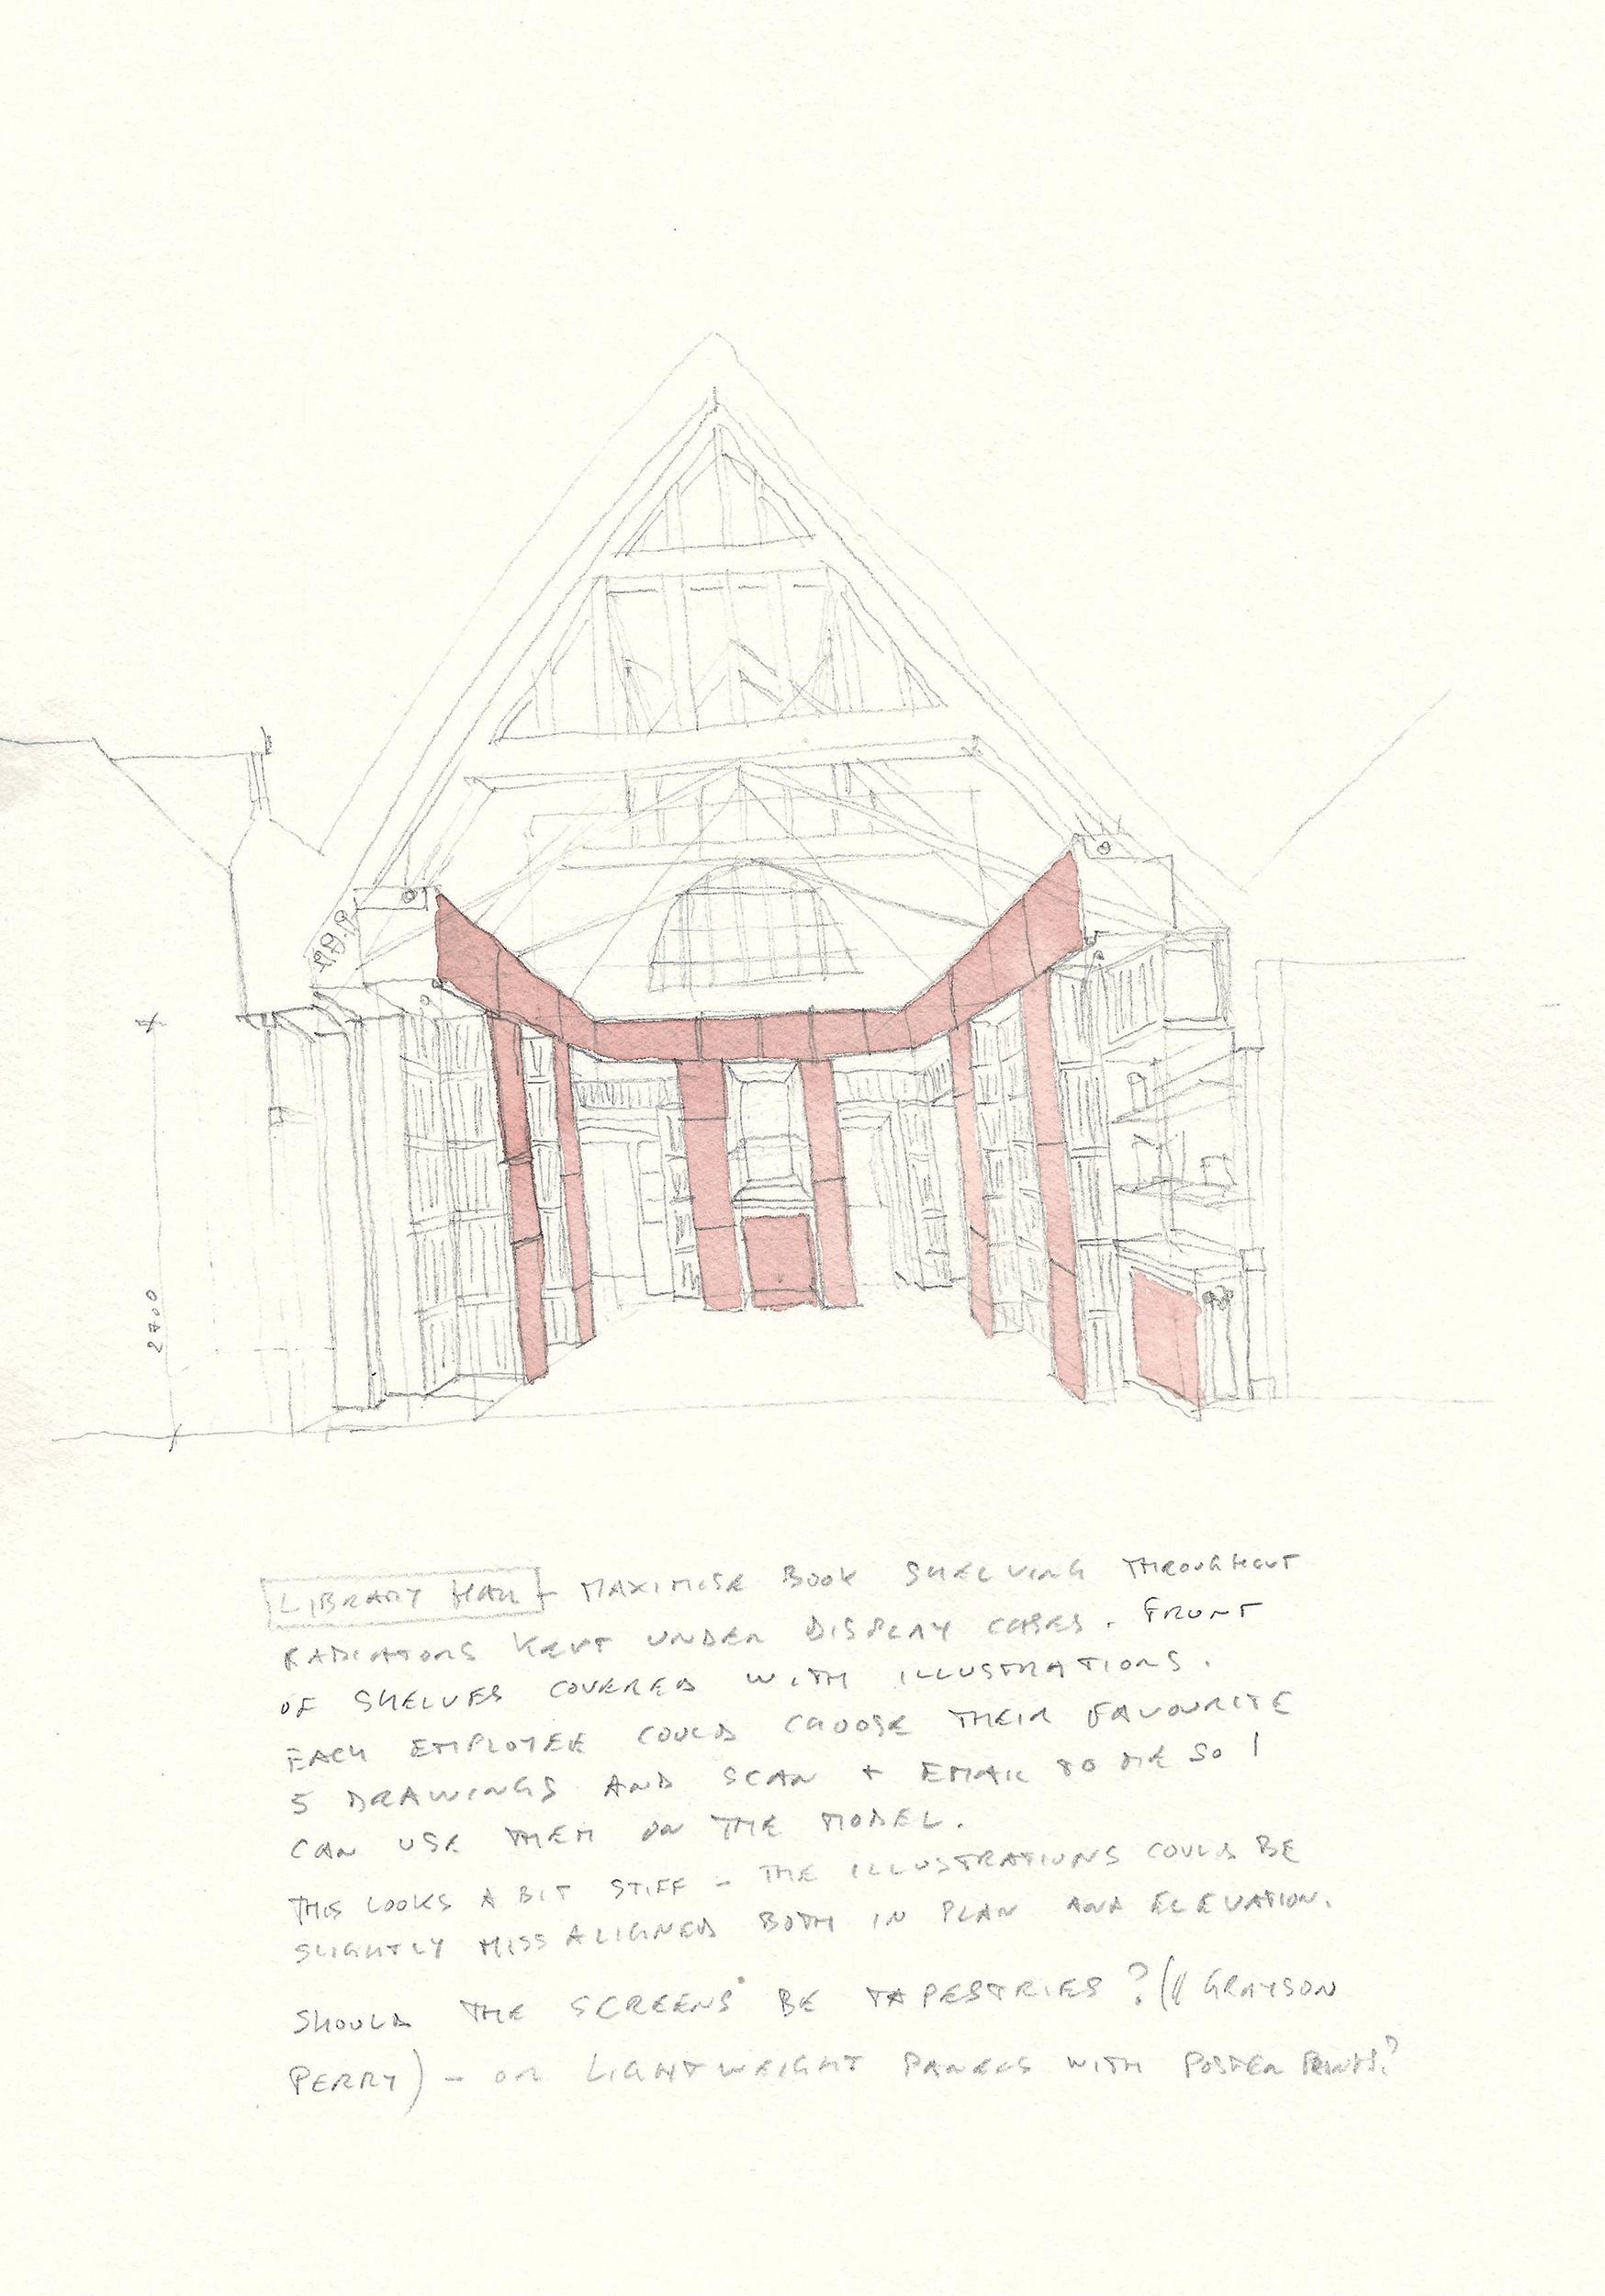 Original concept sketch for the library